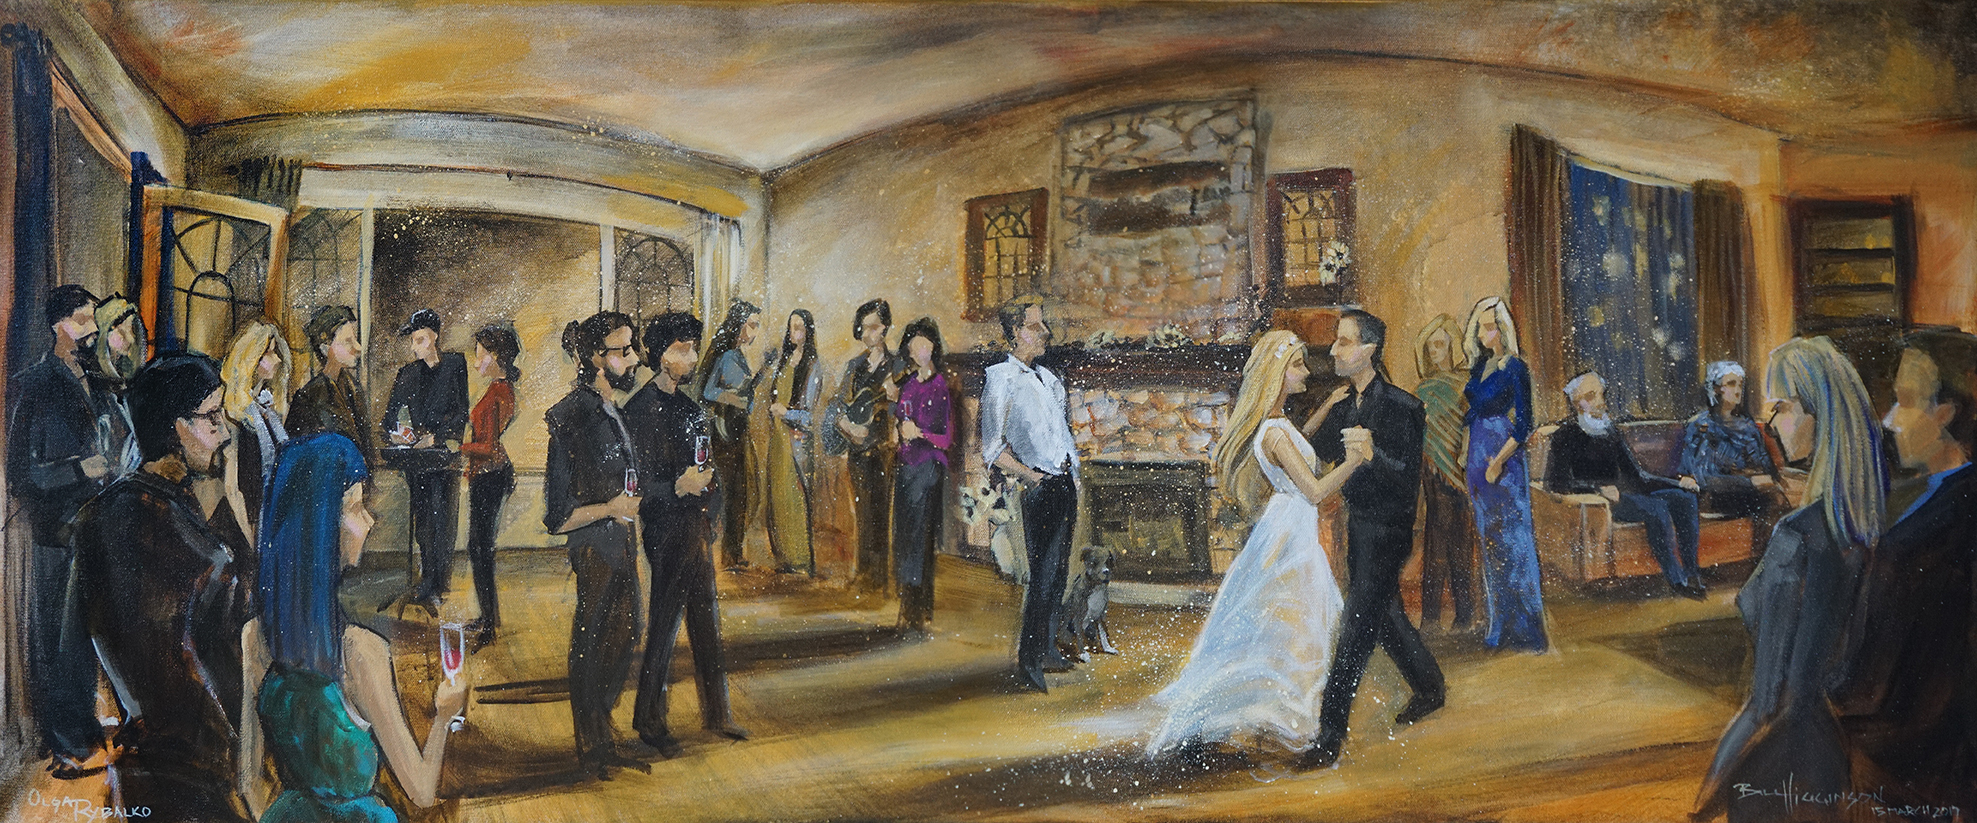 impressions-live-art-wedding-live-painting-vancouver